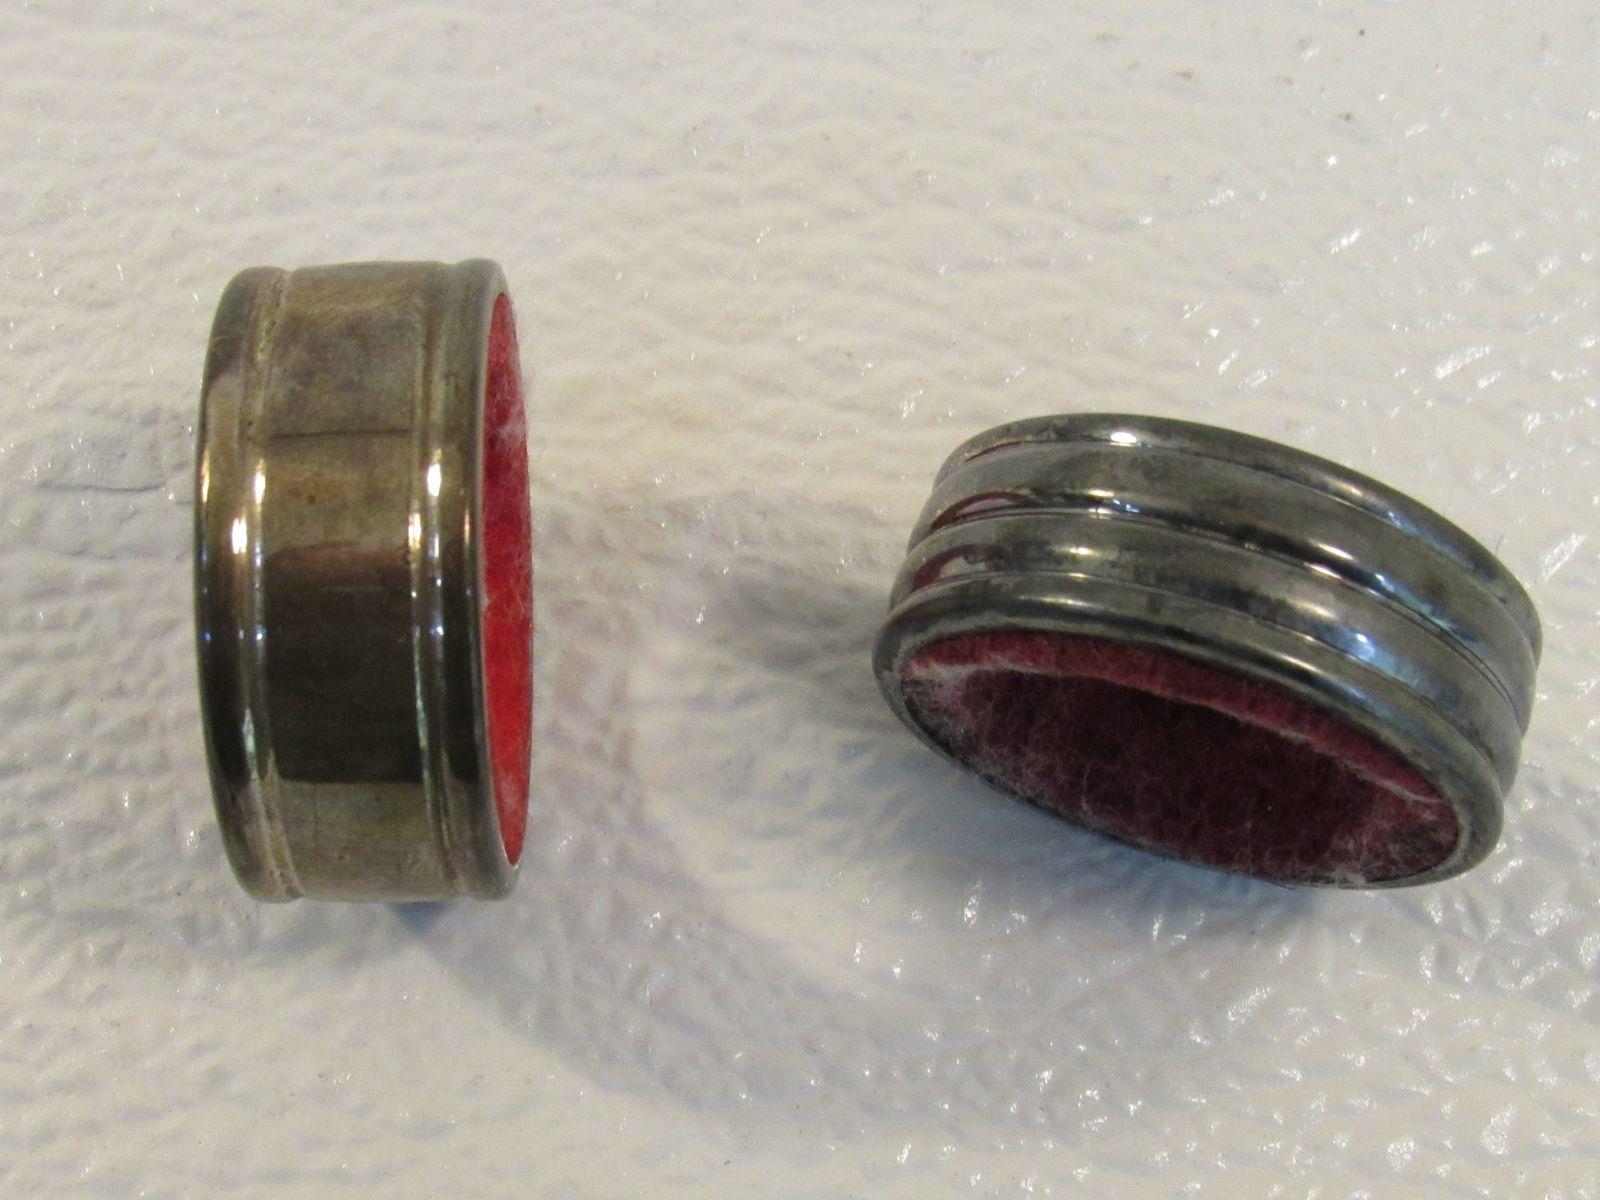 Handcrafted Set of 2 Napkin Holders Round Gray/Red Retro Metal Felt